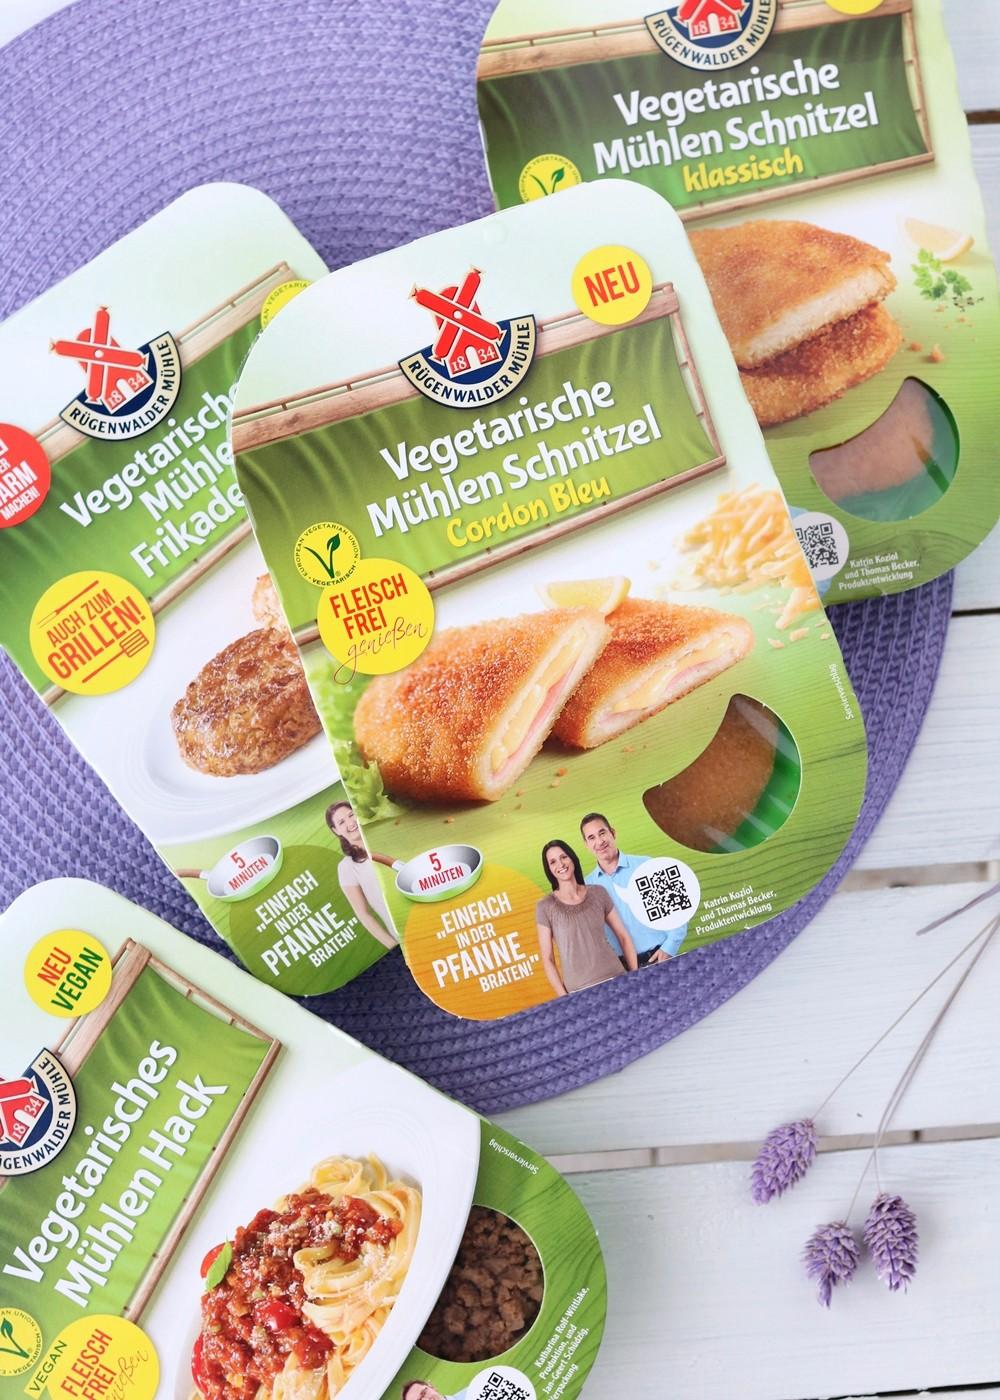 Fashion meets Food Blogparade Blogger Lobster of the year Award Burger Rügenwalder Mühle (11)